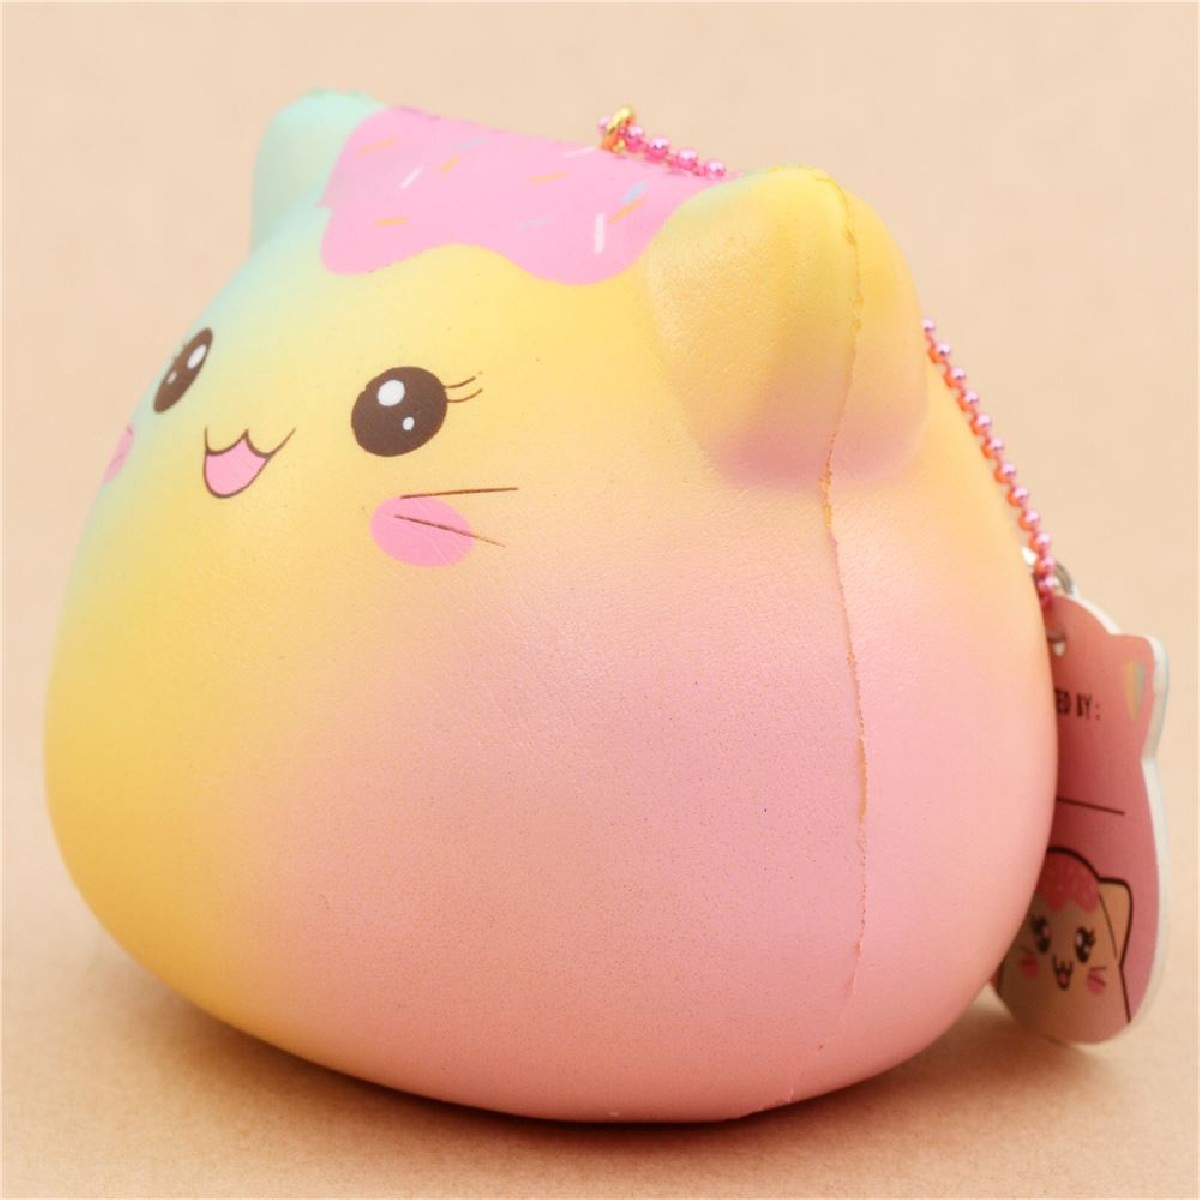 squishy marshmallow